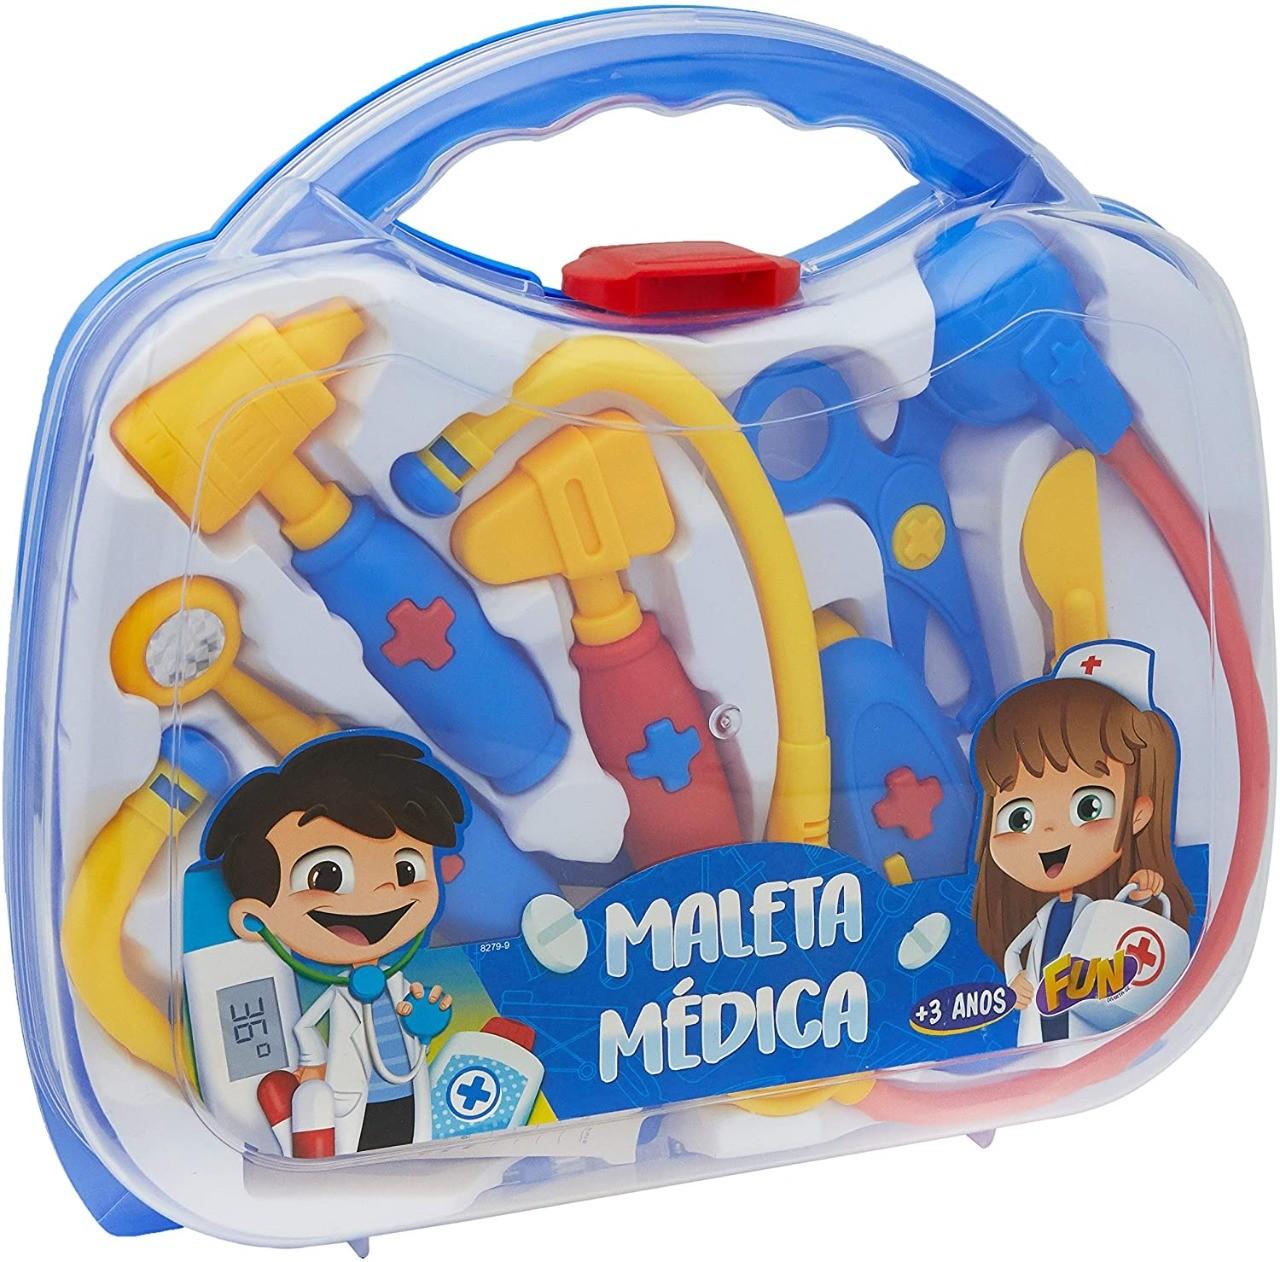 Kit Maleta Médica Infantil Fun